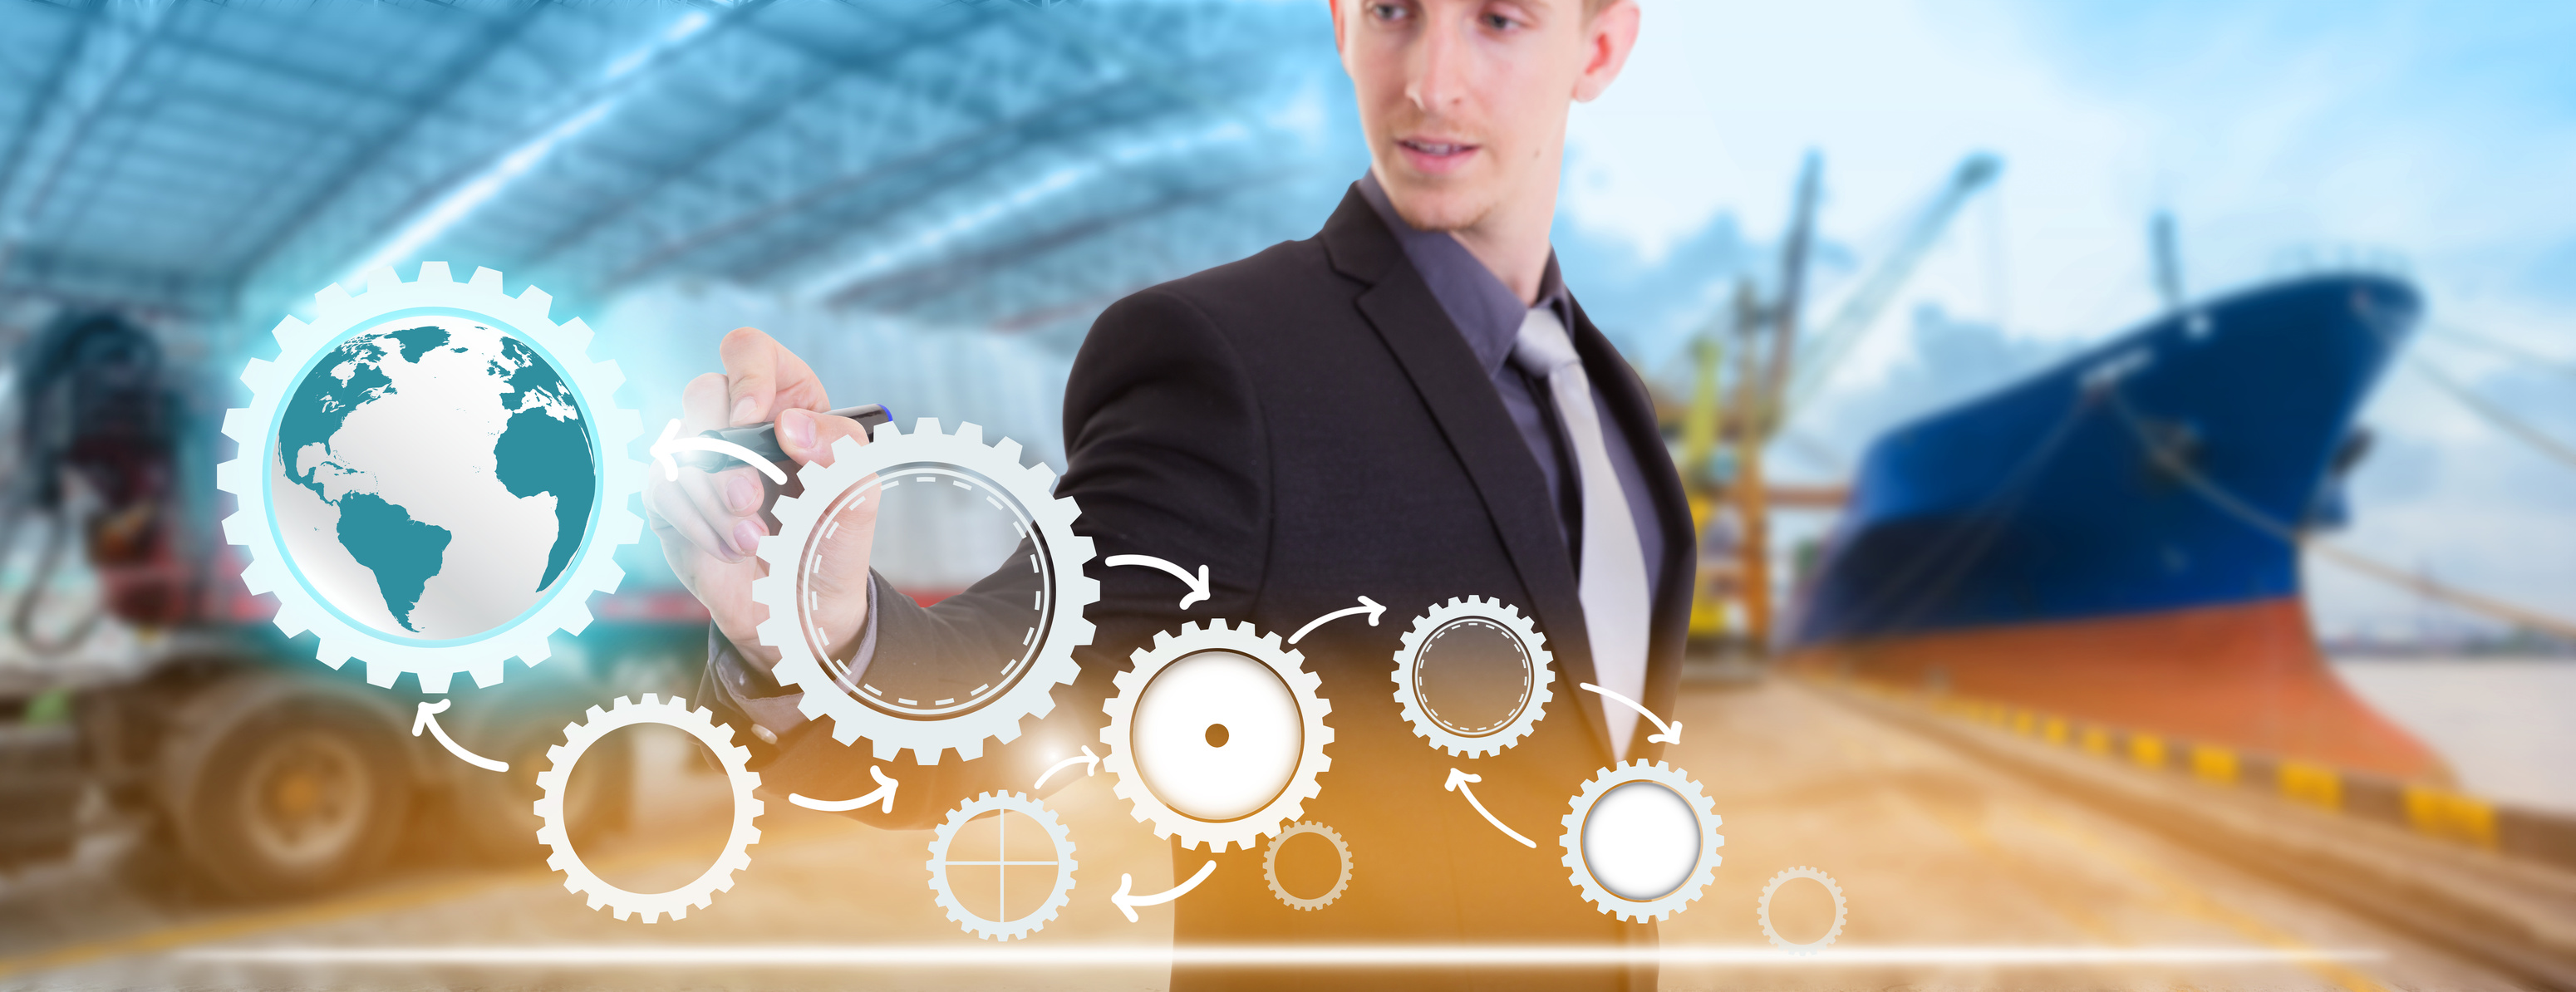 AEOLIX Platform Vision – The transformation of the digital logistics ecosystem